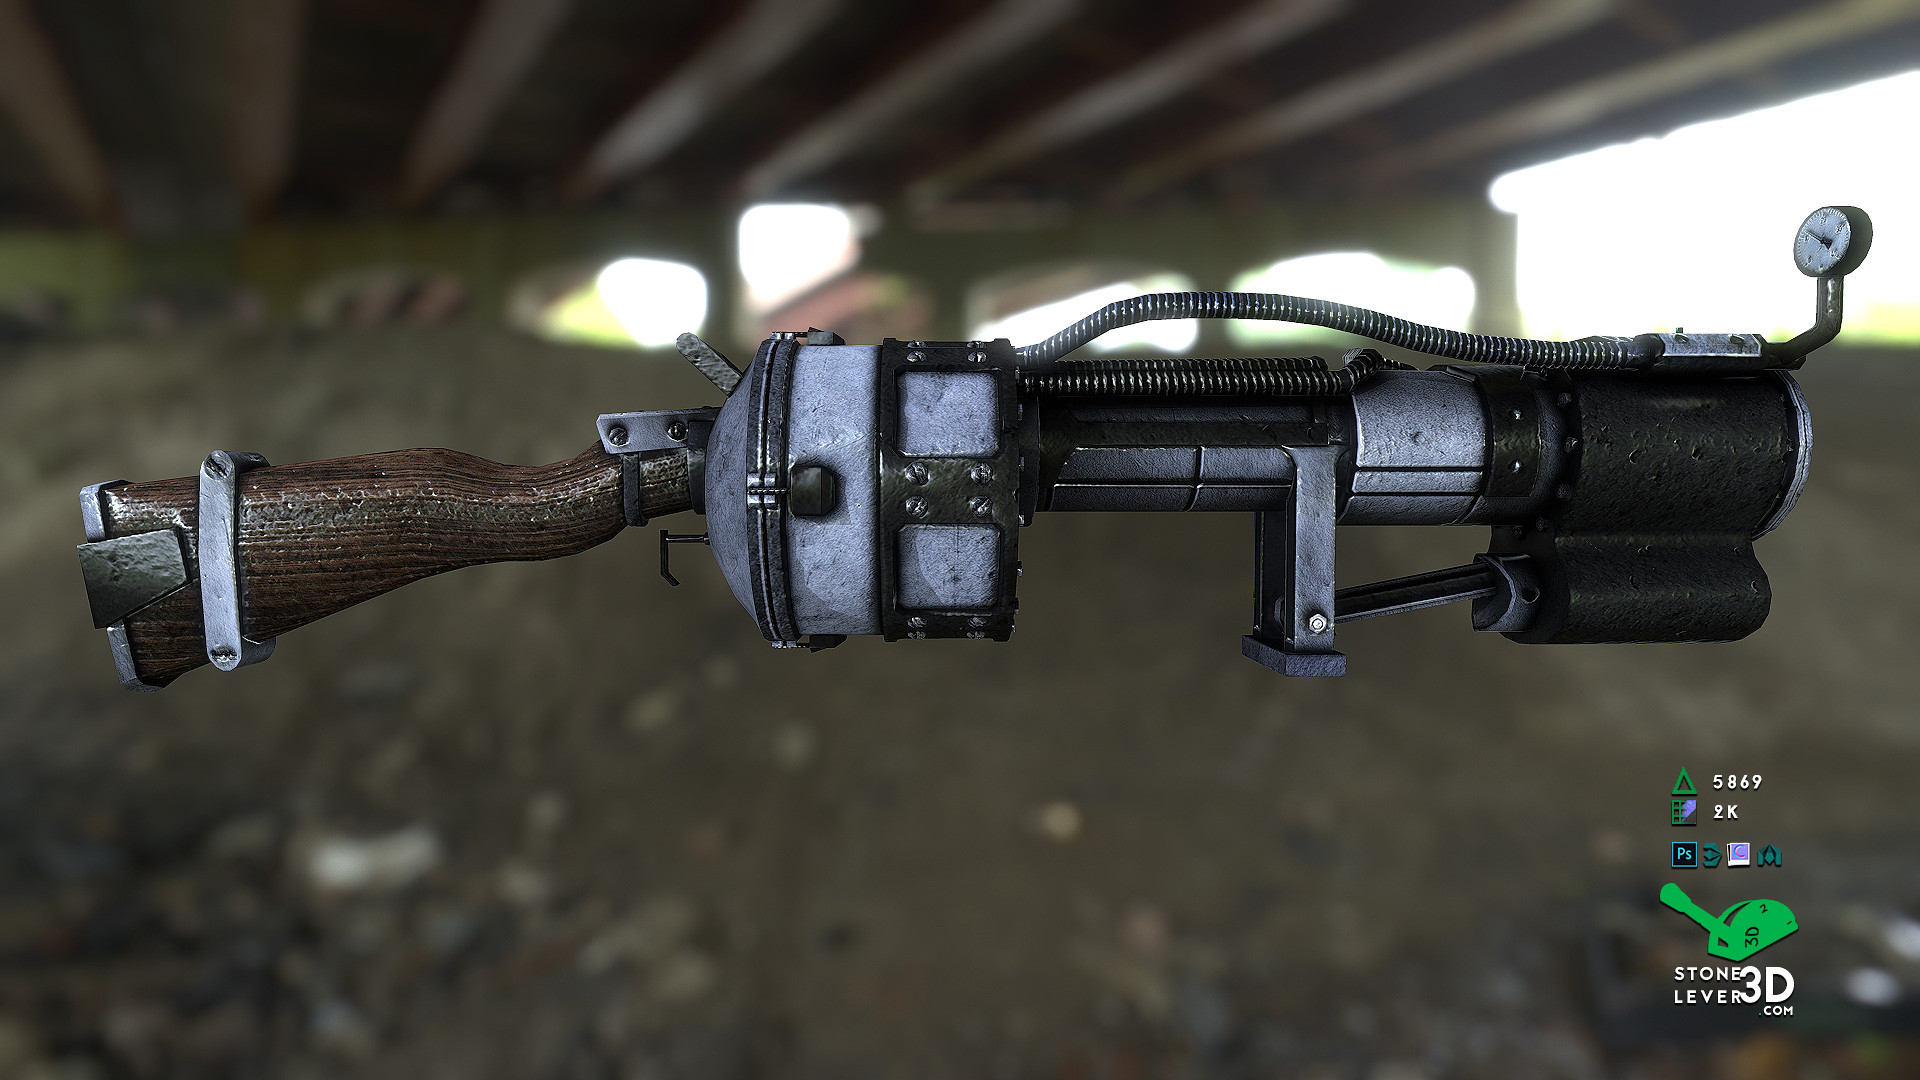 """Railway Rifle"" Weapon Prop Model Replica"